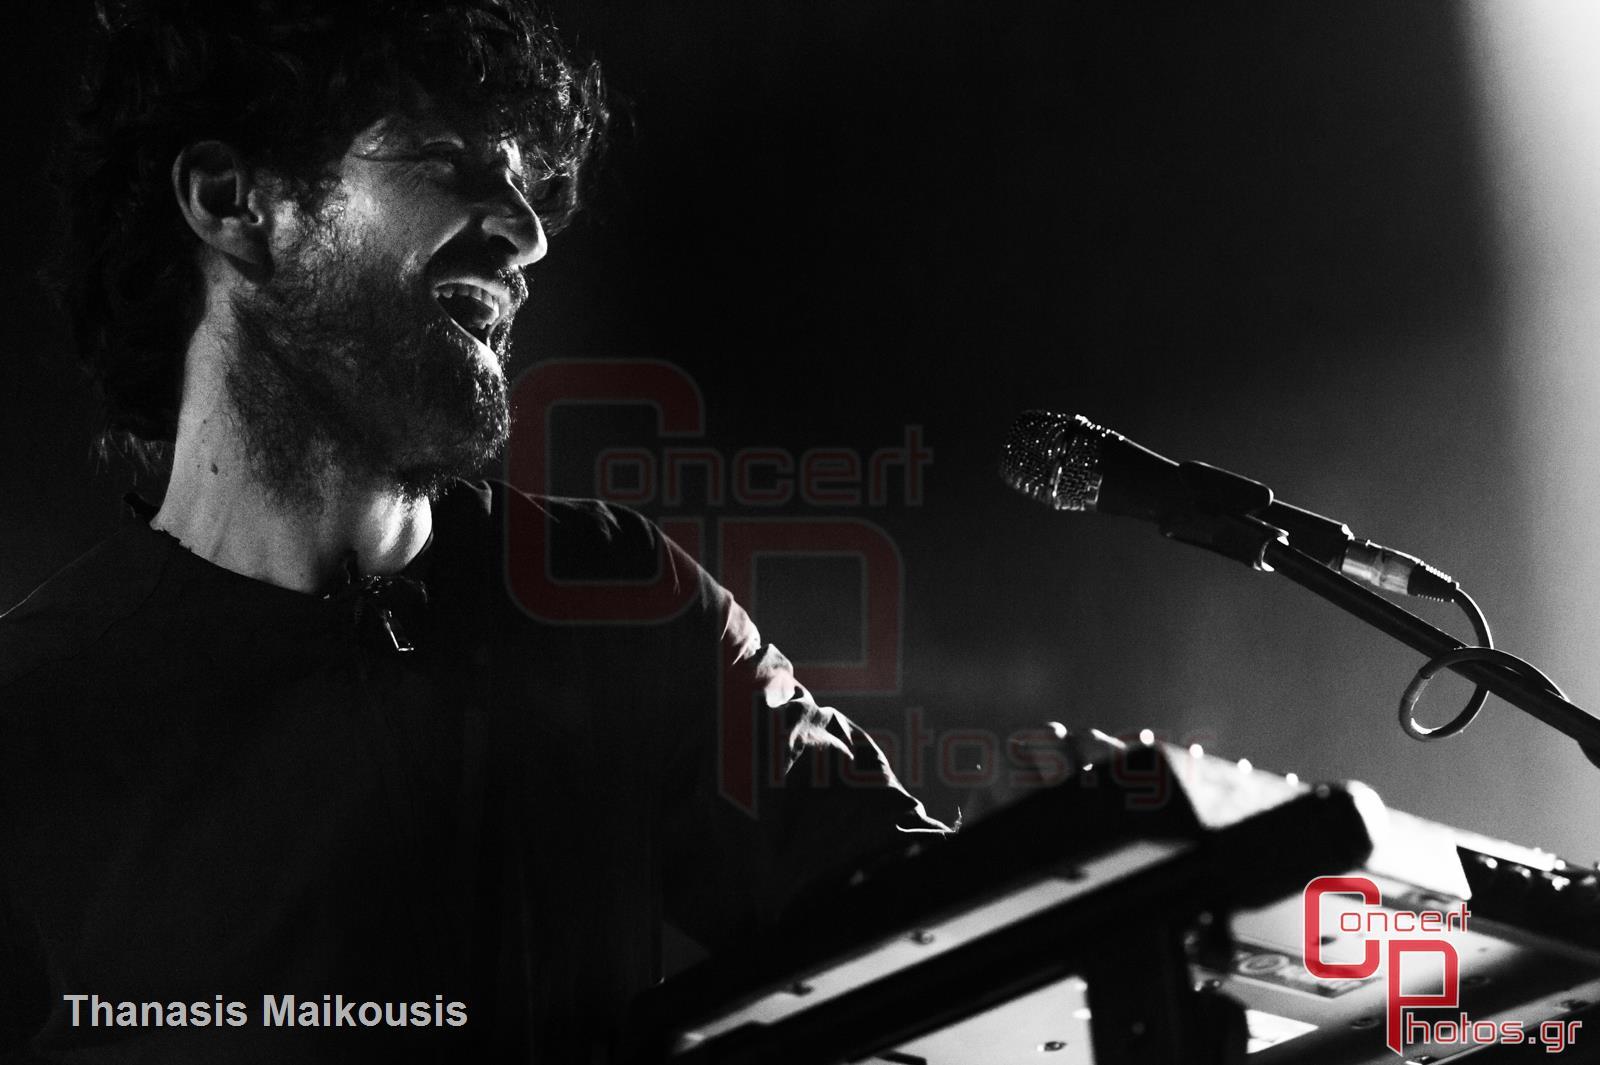 Gramatik-Gramatik Votanikos 2013 photographer: Thanasis Maikousis - ConcertPhotos-5228